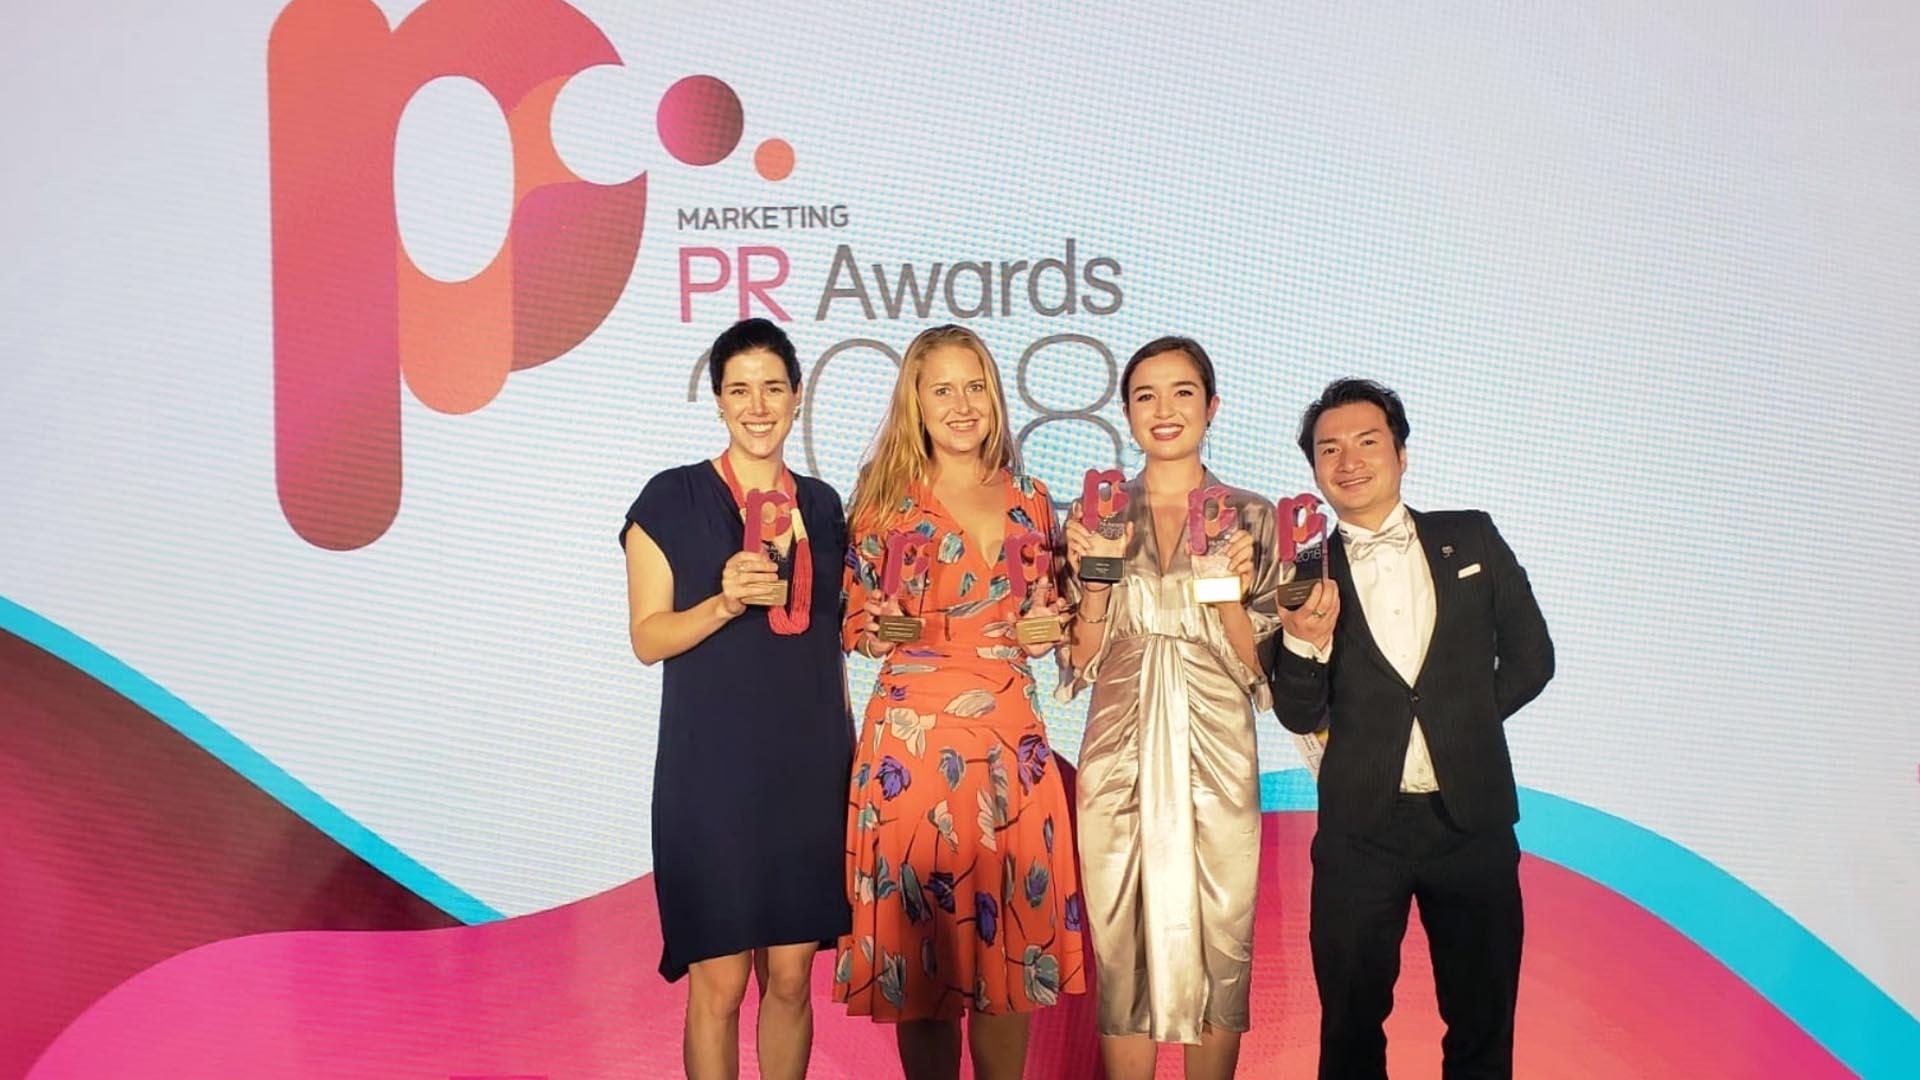 PR Awards 2018 Sinclair - featured image